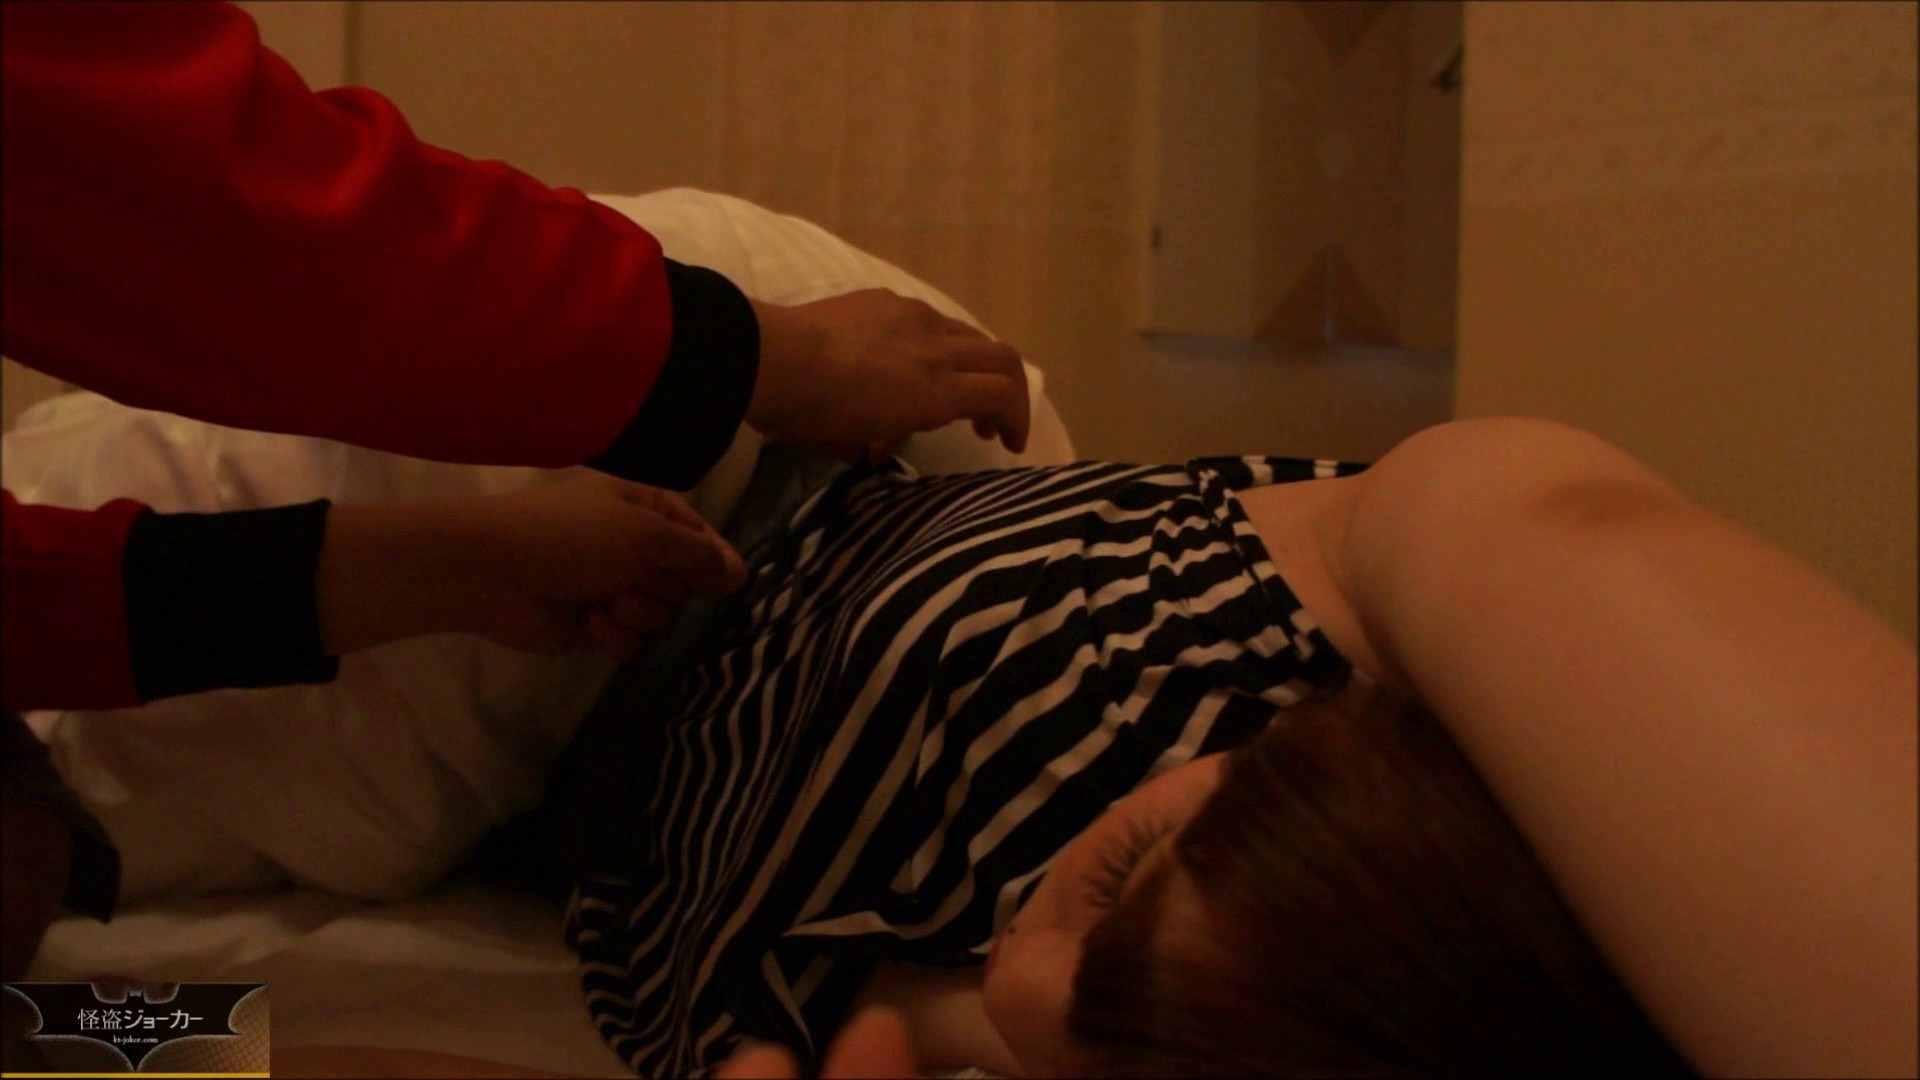 vol.4【白衣の天使23歳】☆のりこちゃん☆ホテルお持ち帰り。朦朧のまま感じて 美肌  109画像 52